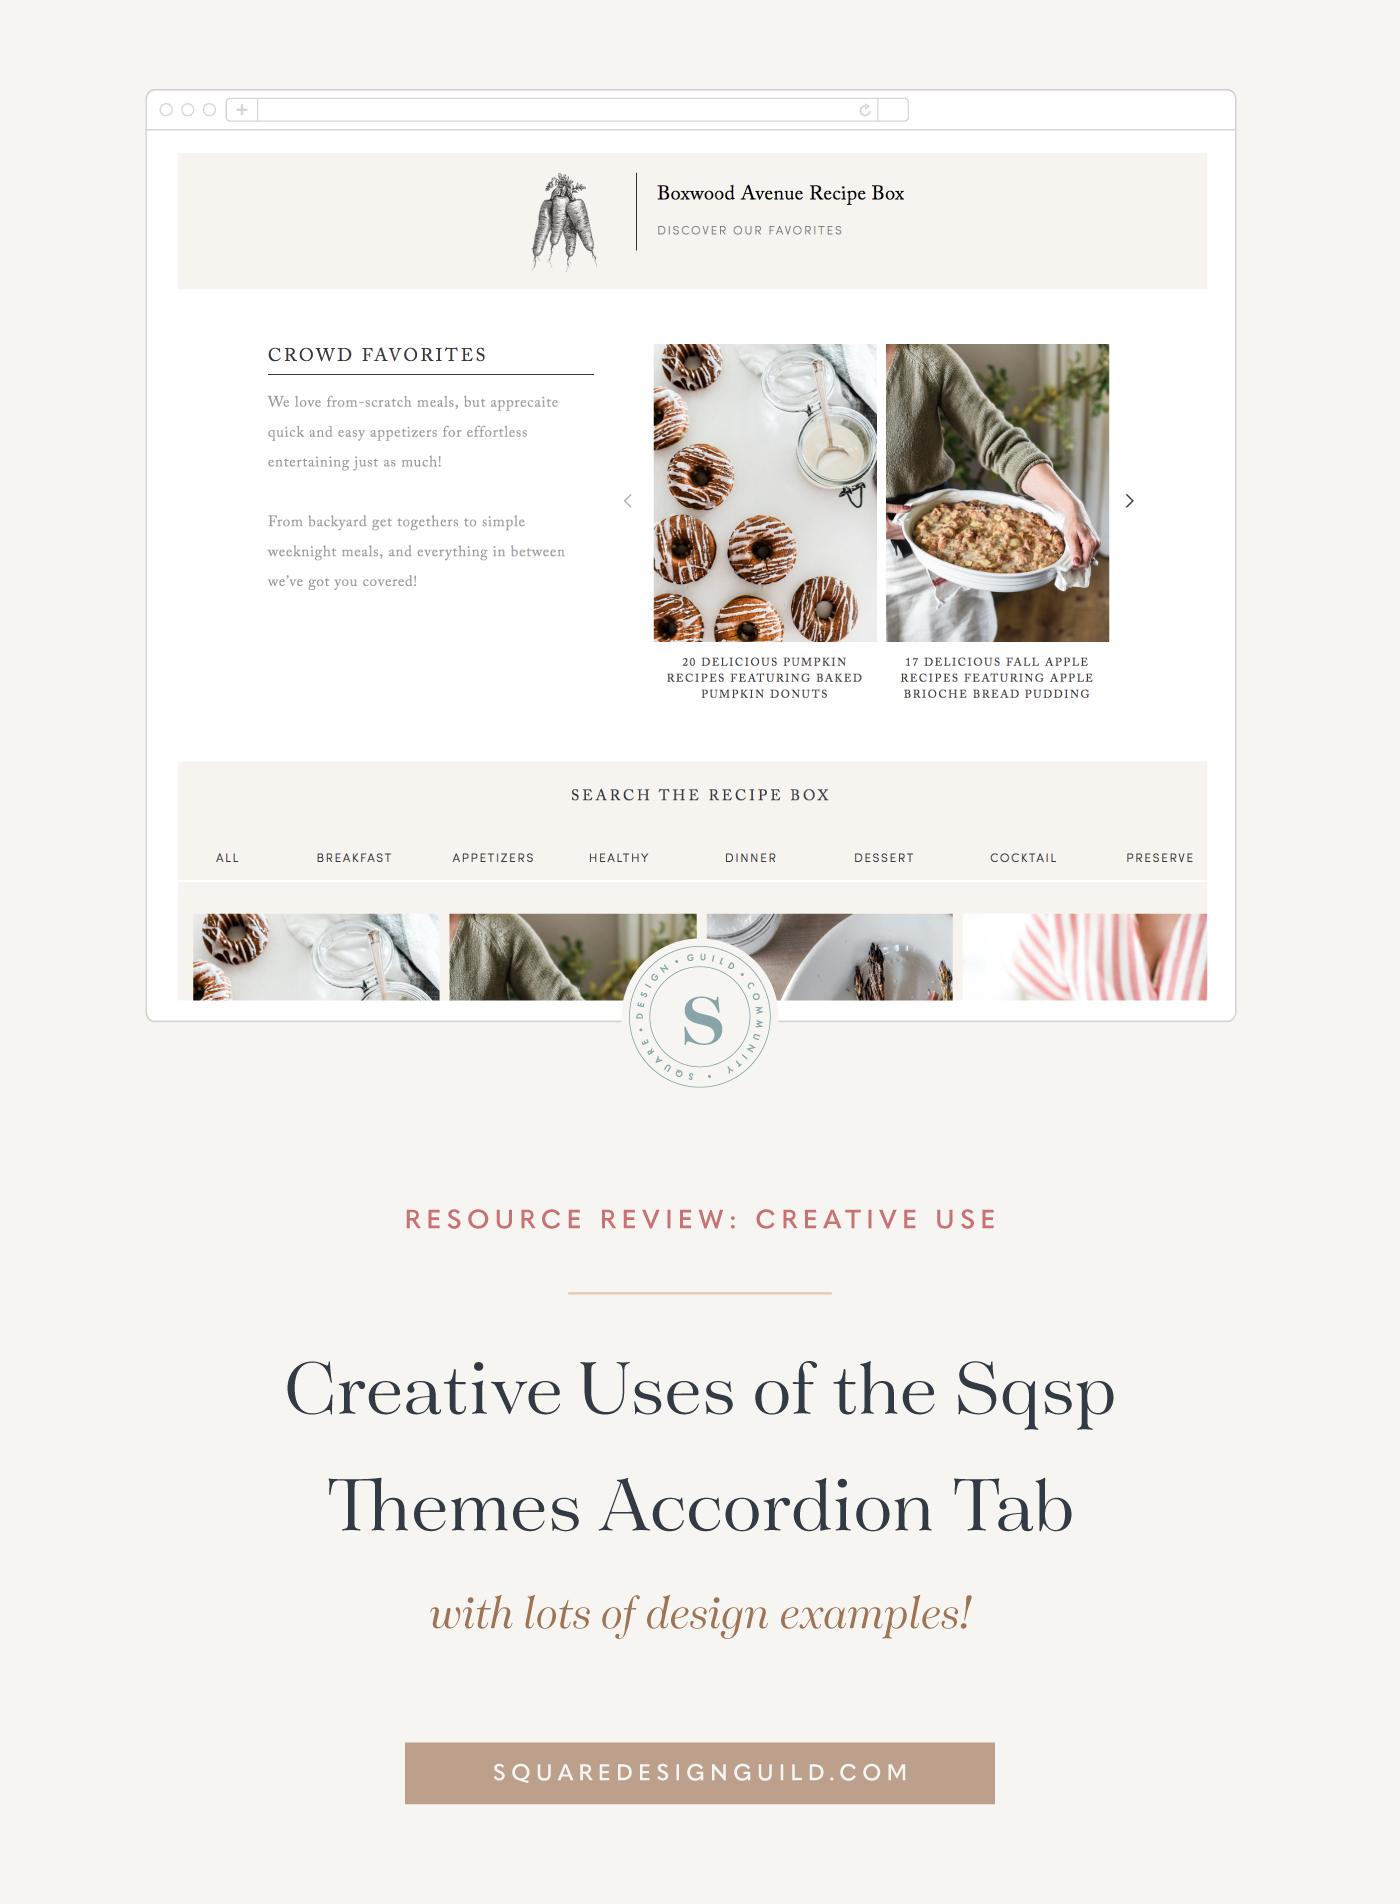 Creative Uses Of The Sqspthemes Accordion Tab Square Design Guild Web Development Design Squarespace Web Design Creative